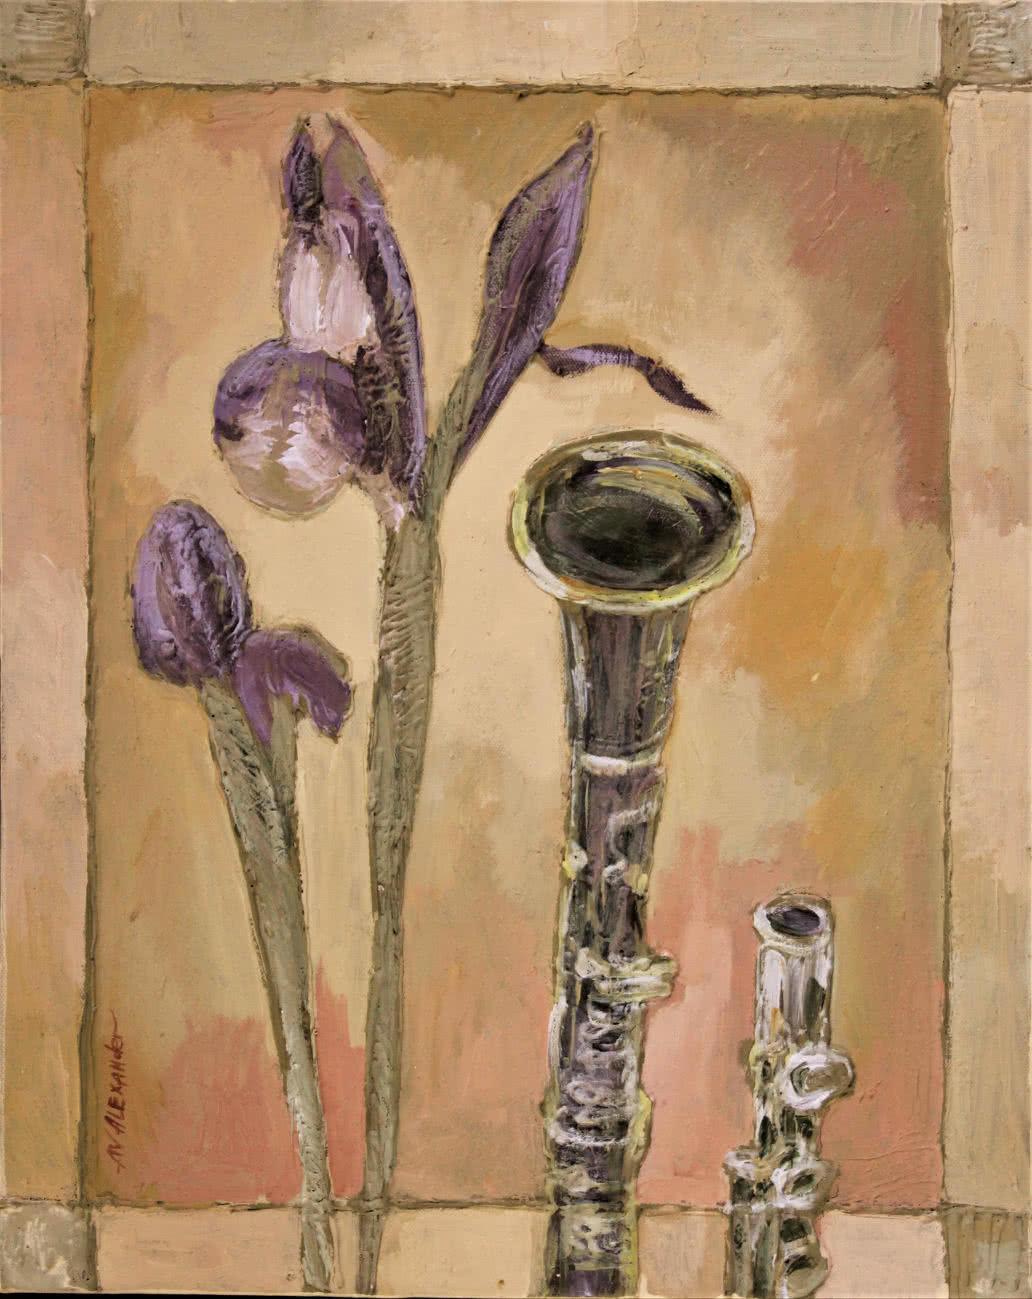 Painting of flowers irises original artwork artistny painting of flowers irises original artwork izmirmasajfo